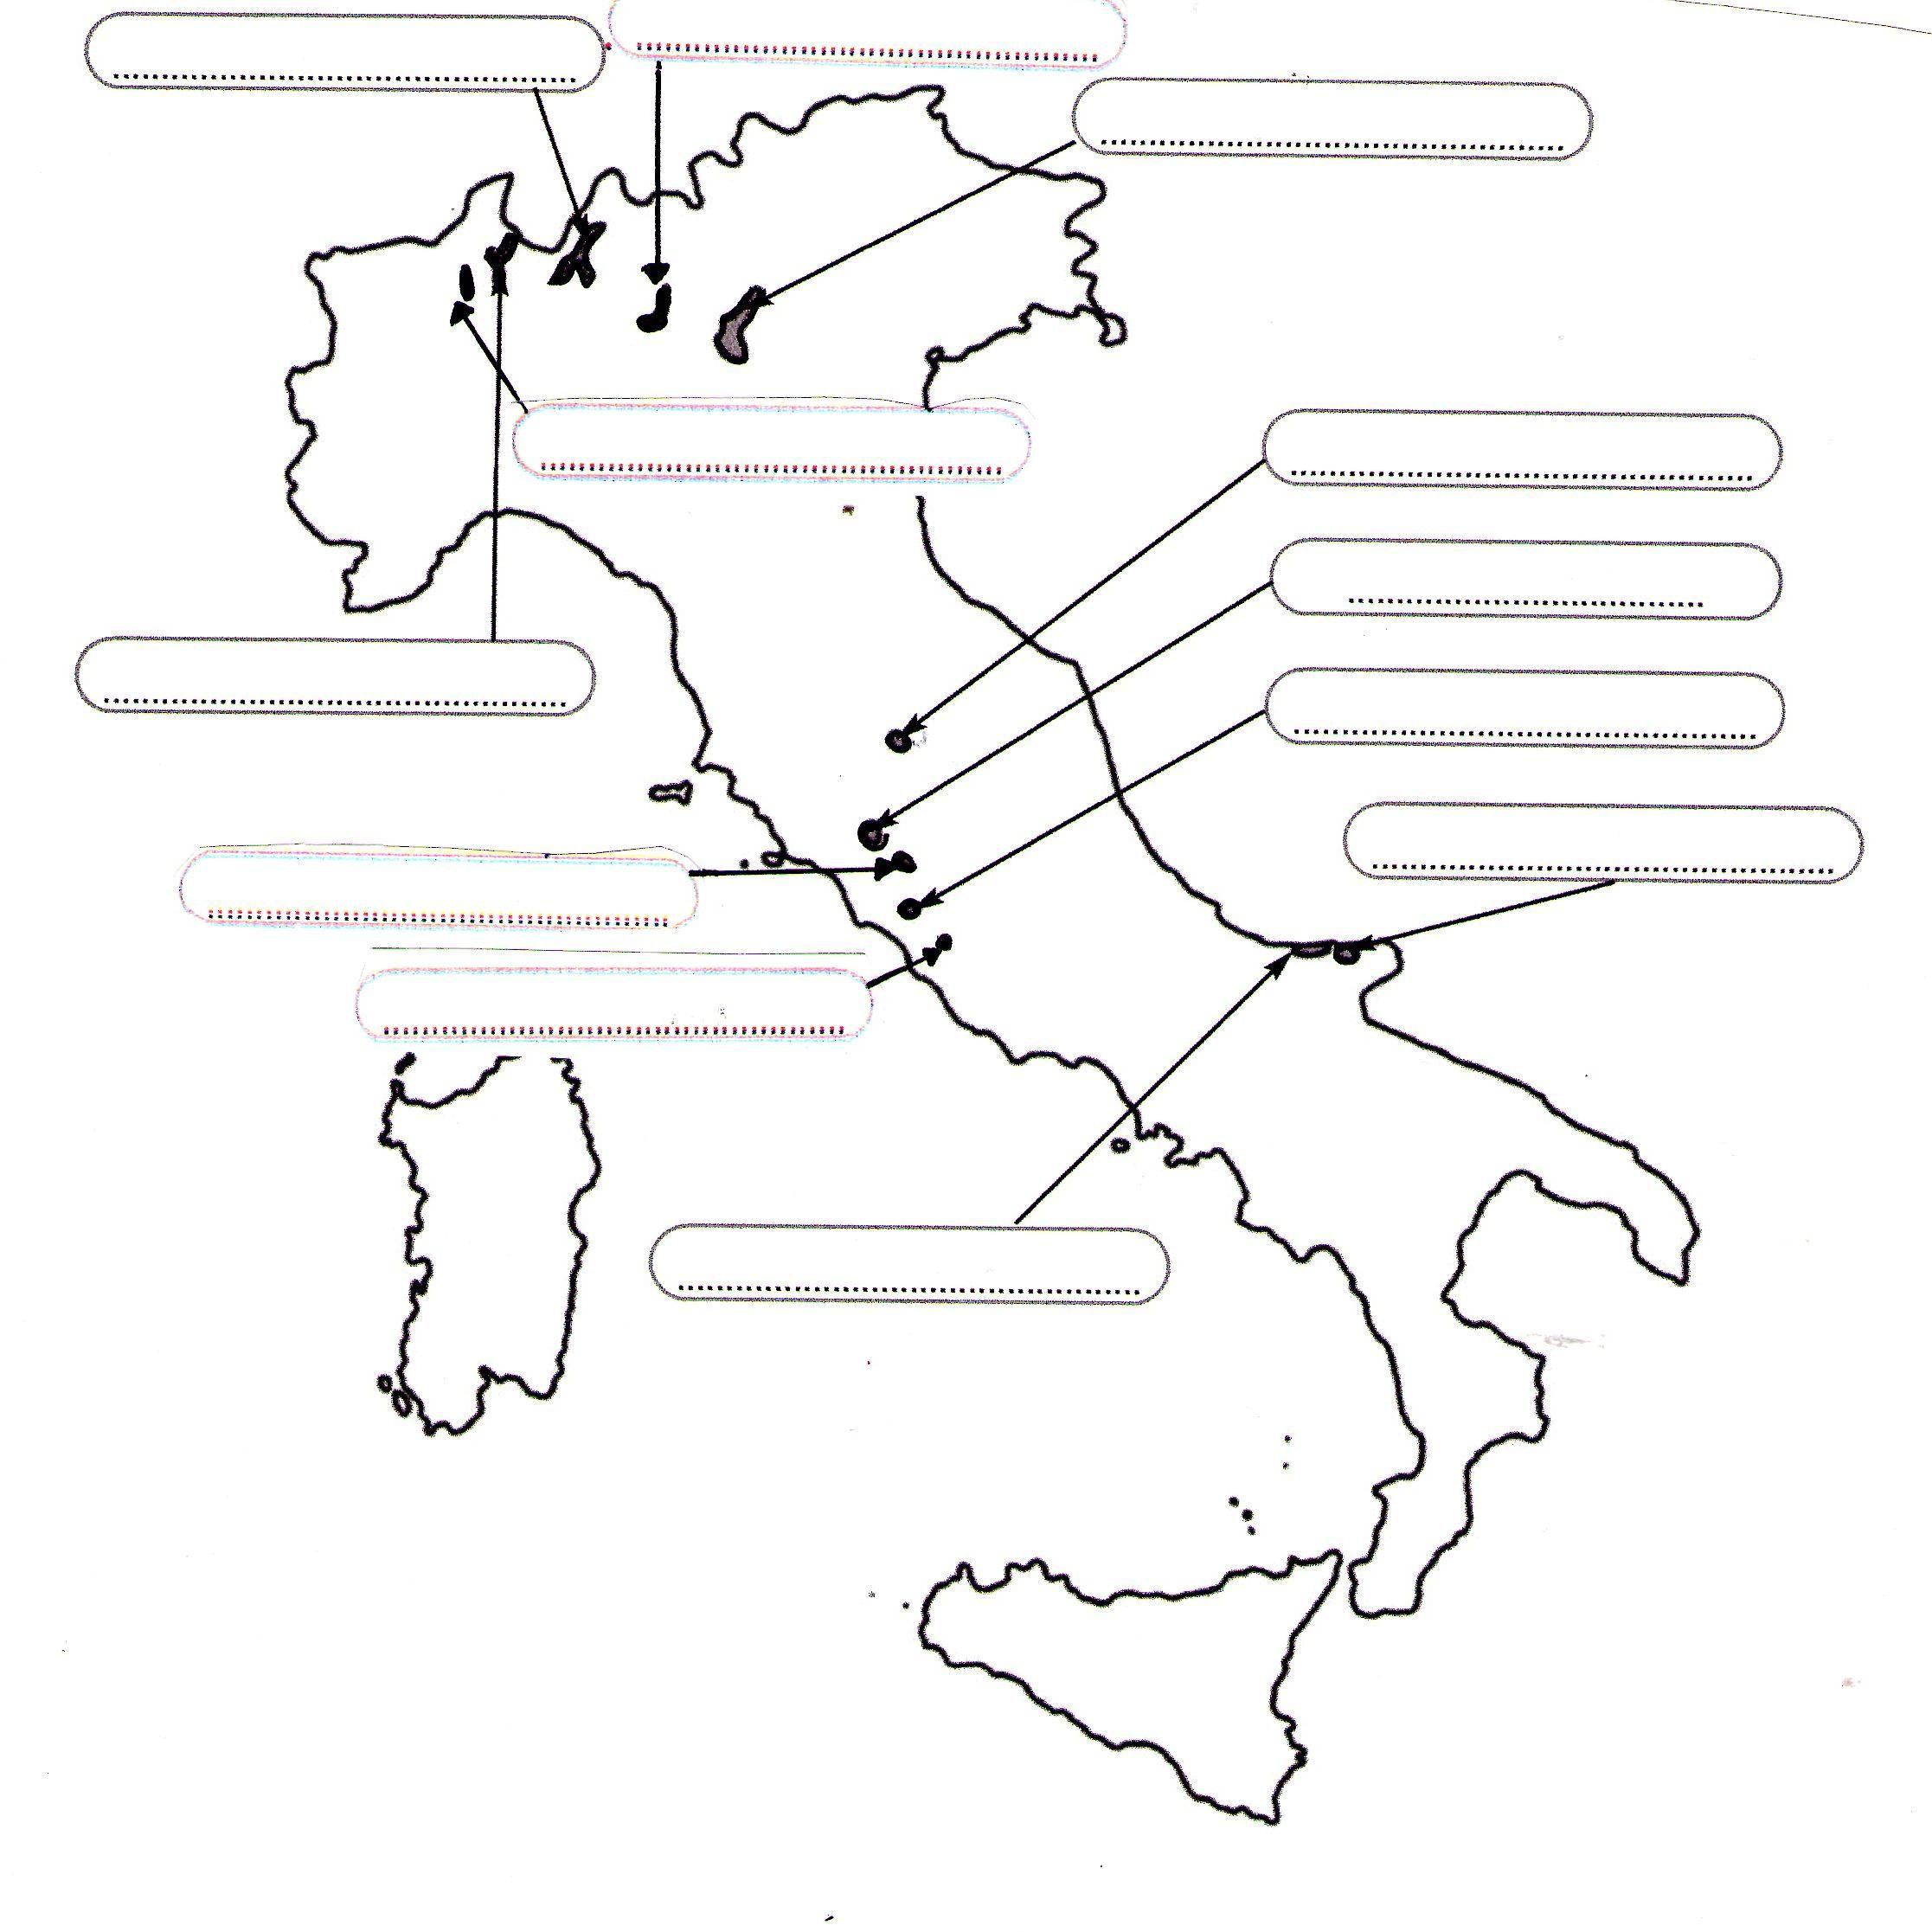 Esercizi Cartina Muta Italia.Laghitaliani Cartamuta Jpg 2233 2233 Scuola Immagini Geografia